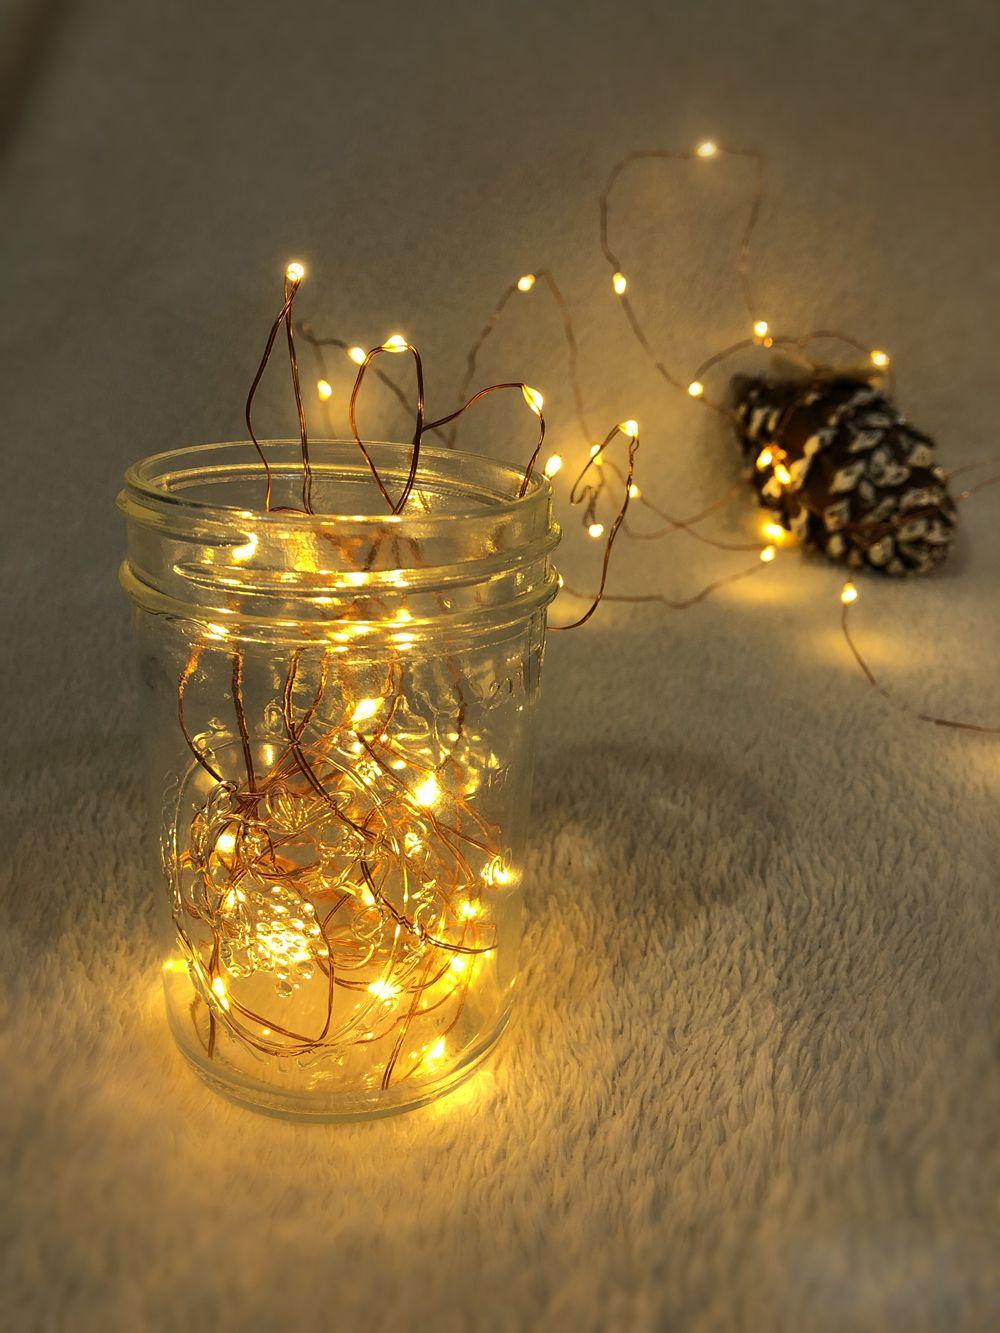 Fairy Lights Battery Operated for Bedroom Indoor Outdoor